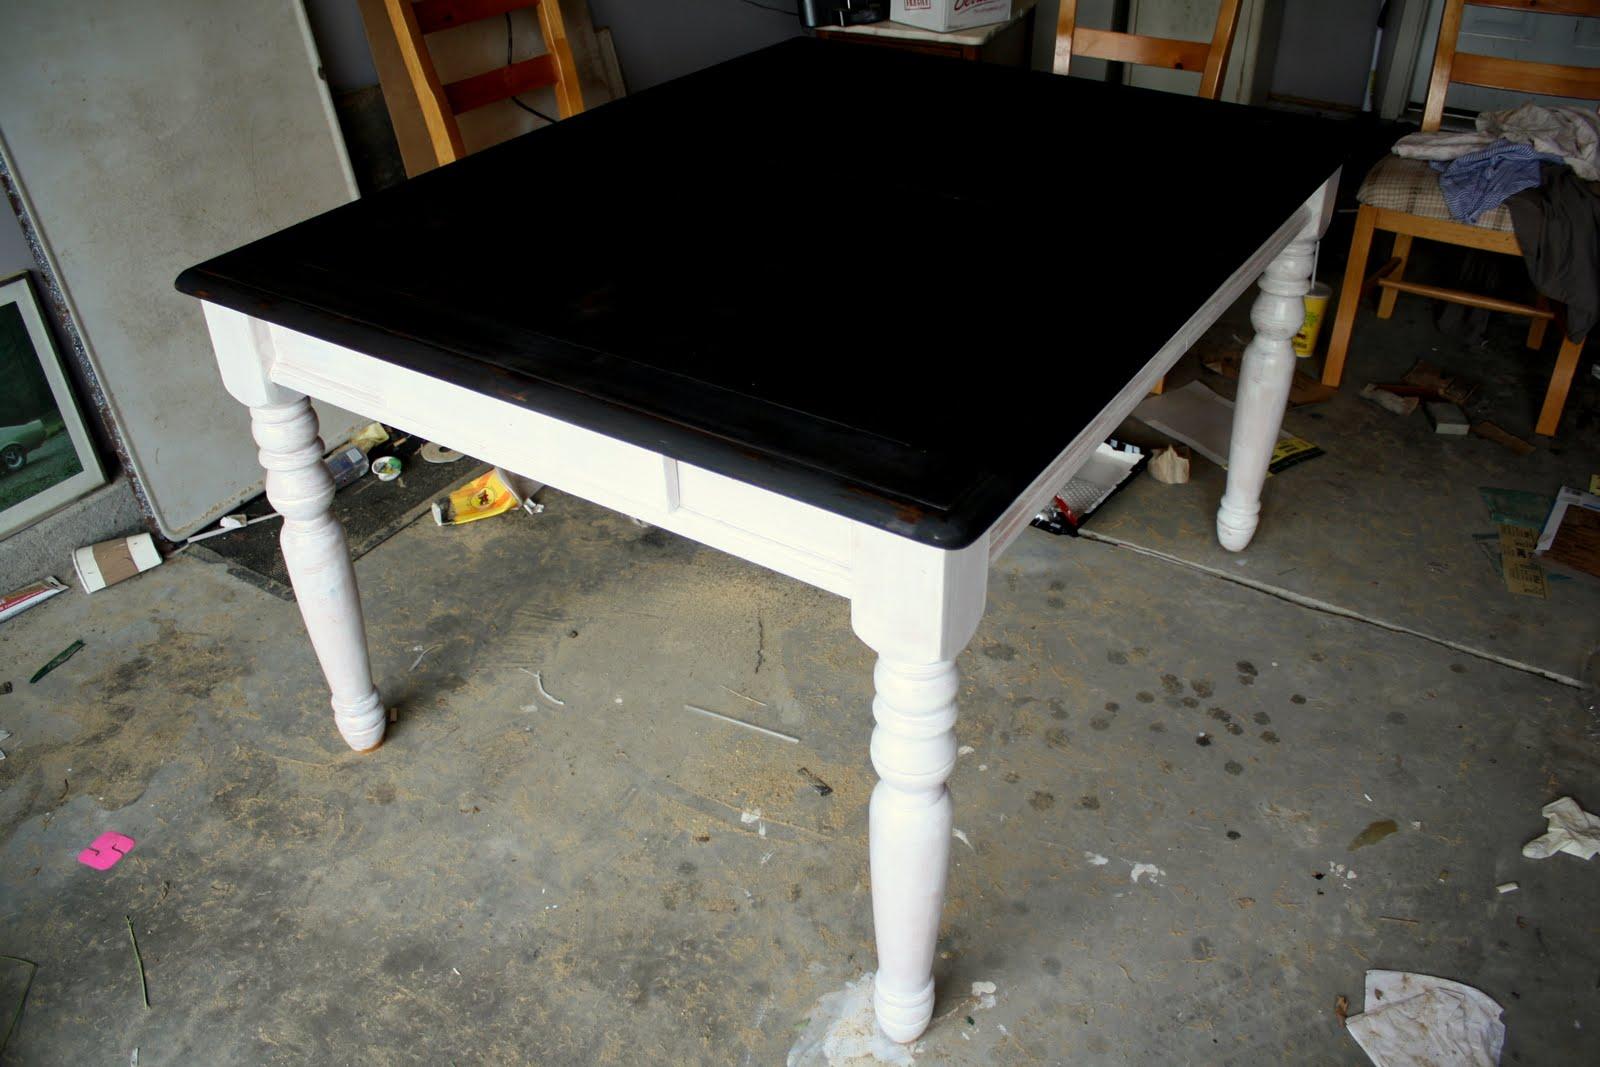 refinishing dining room table refinish kitchen table Refinishing the Dining Room Table